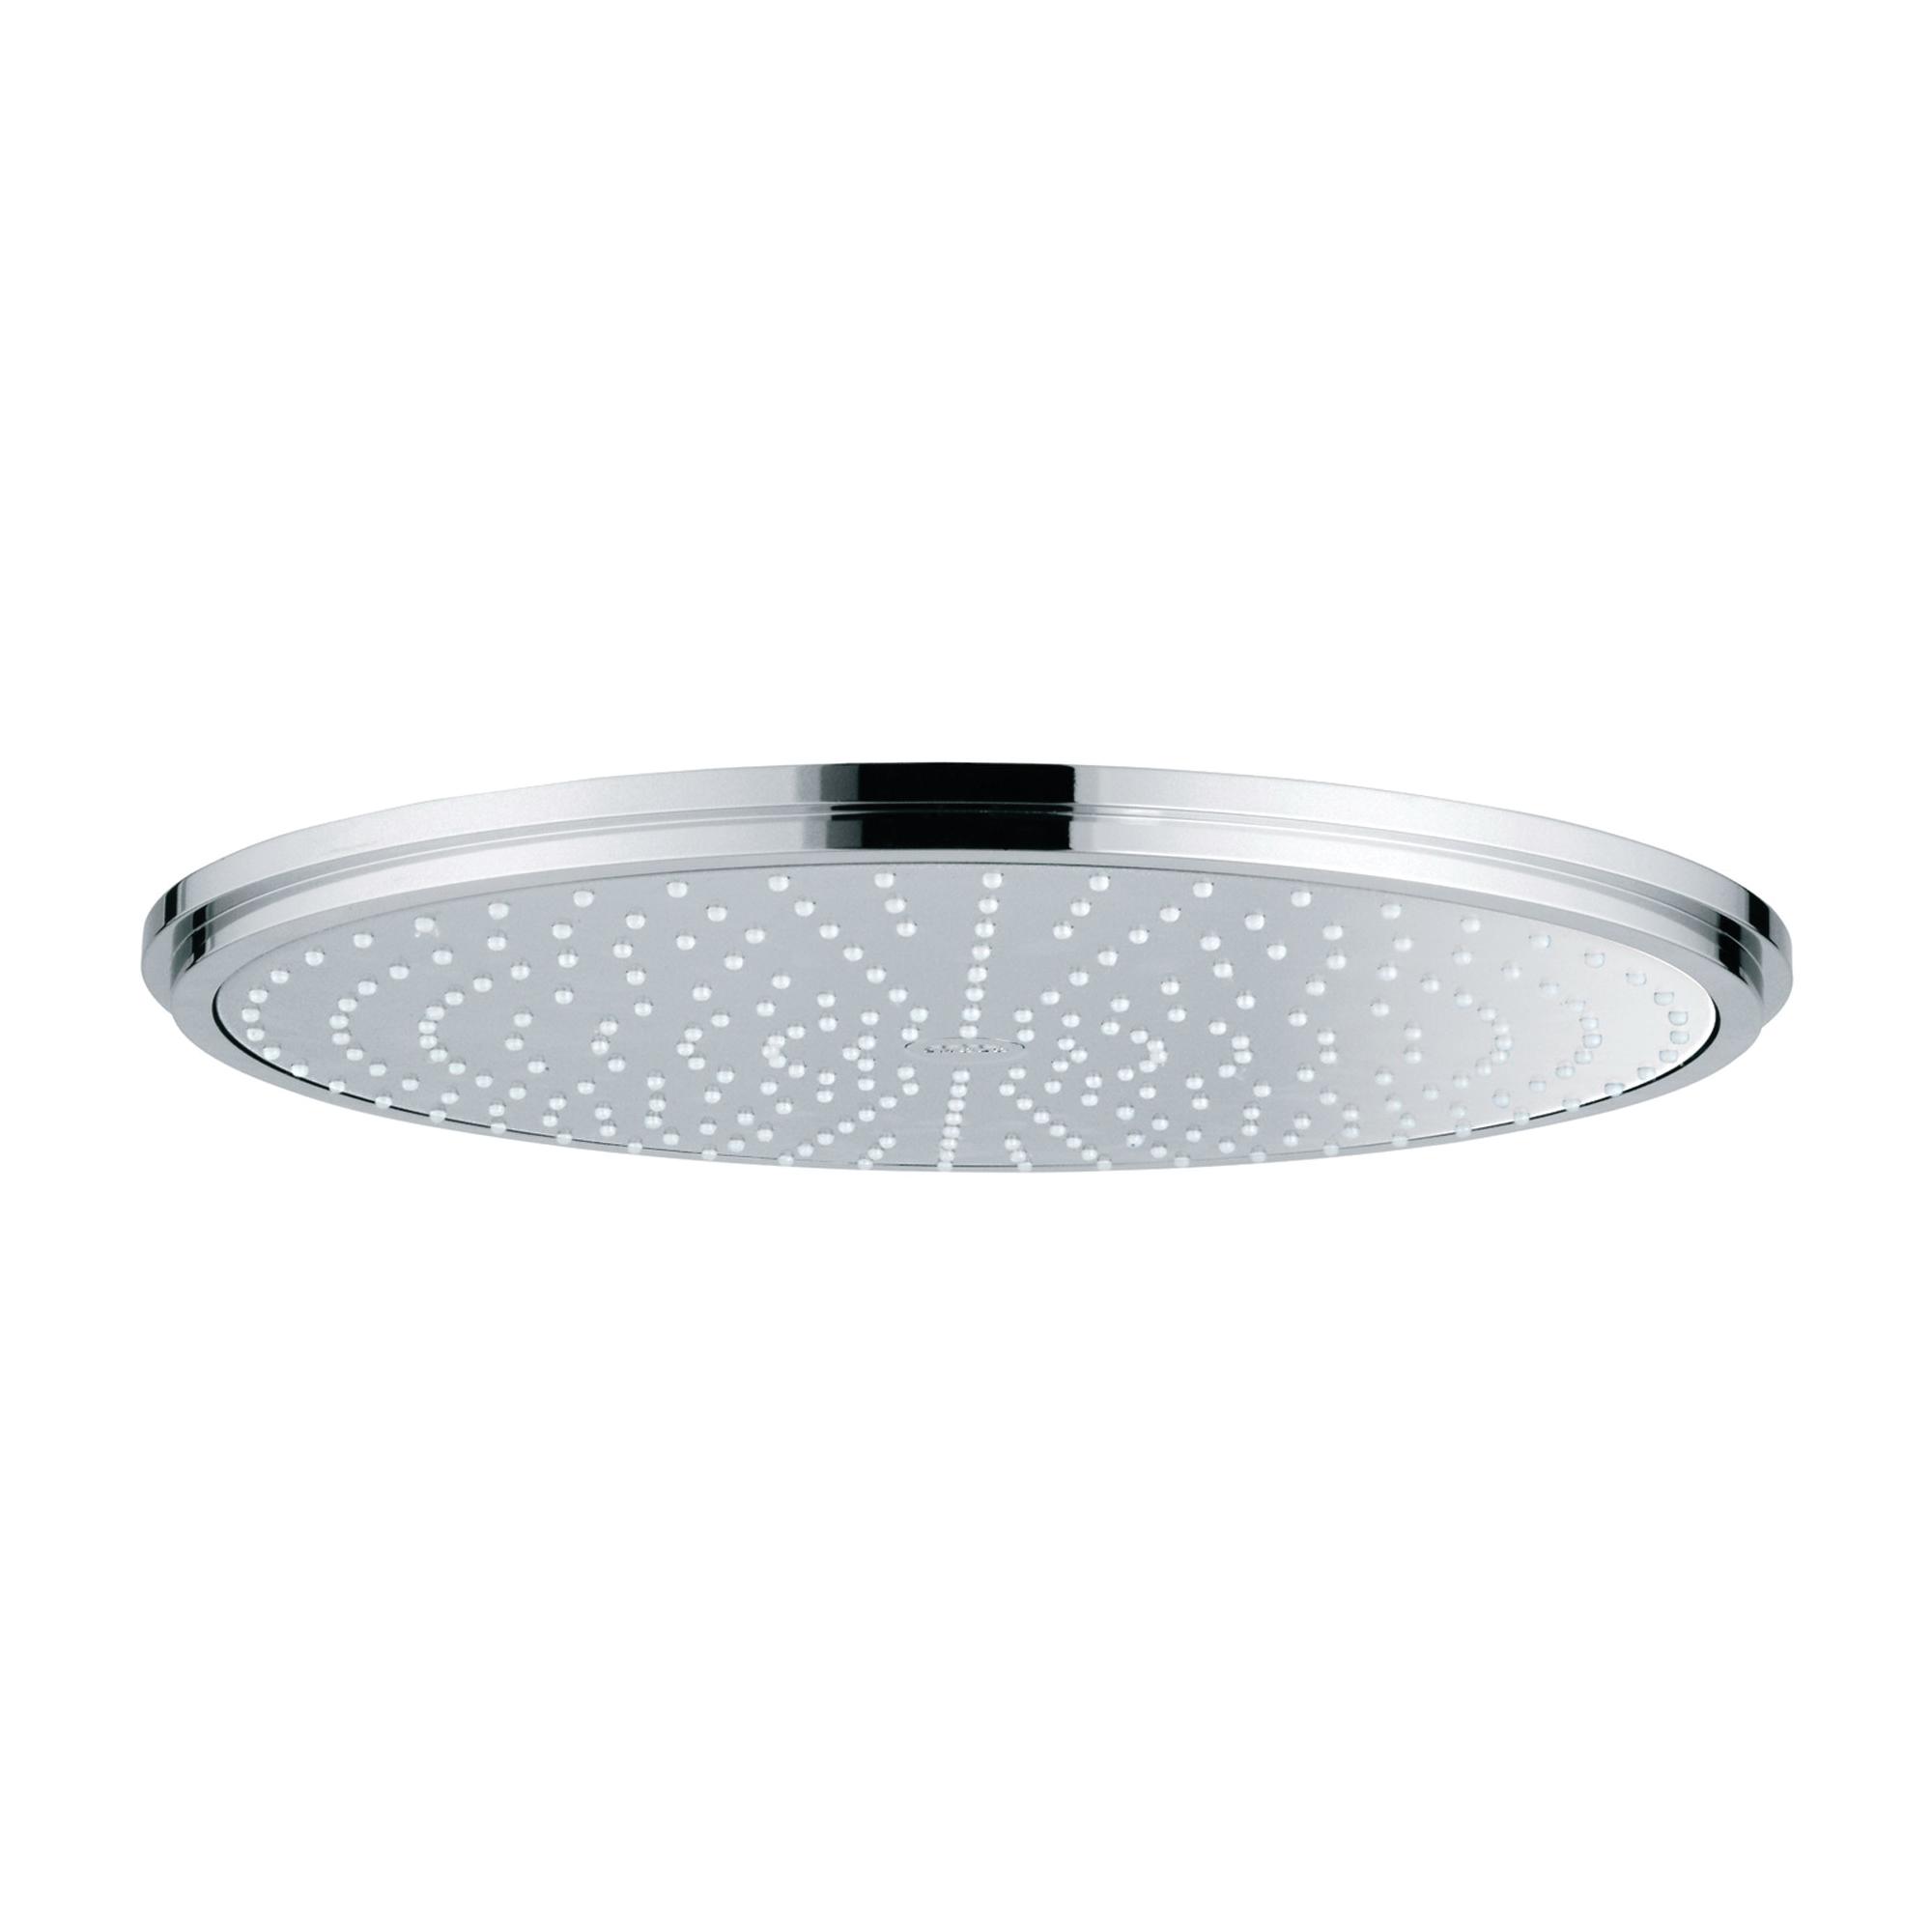 GROHE 28783000 Rainshower® Cosmopolitan 400 Shower Head, 2.5 gpm, 1 Spray, Wall Mount, 4 in Dia Head, Import